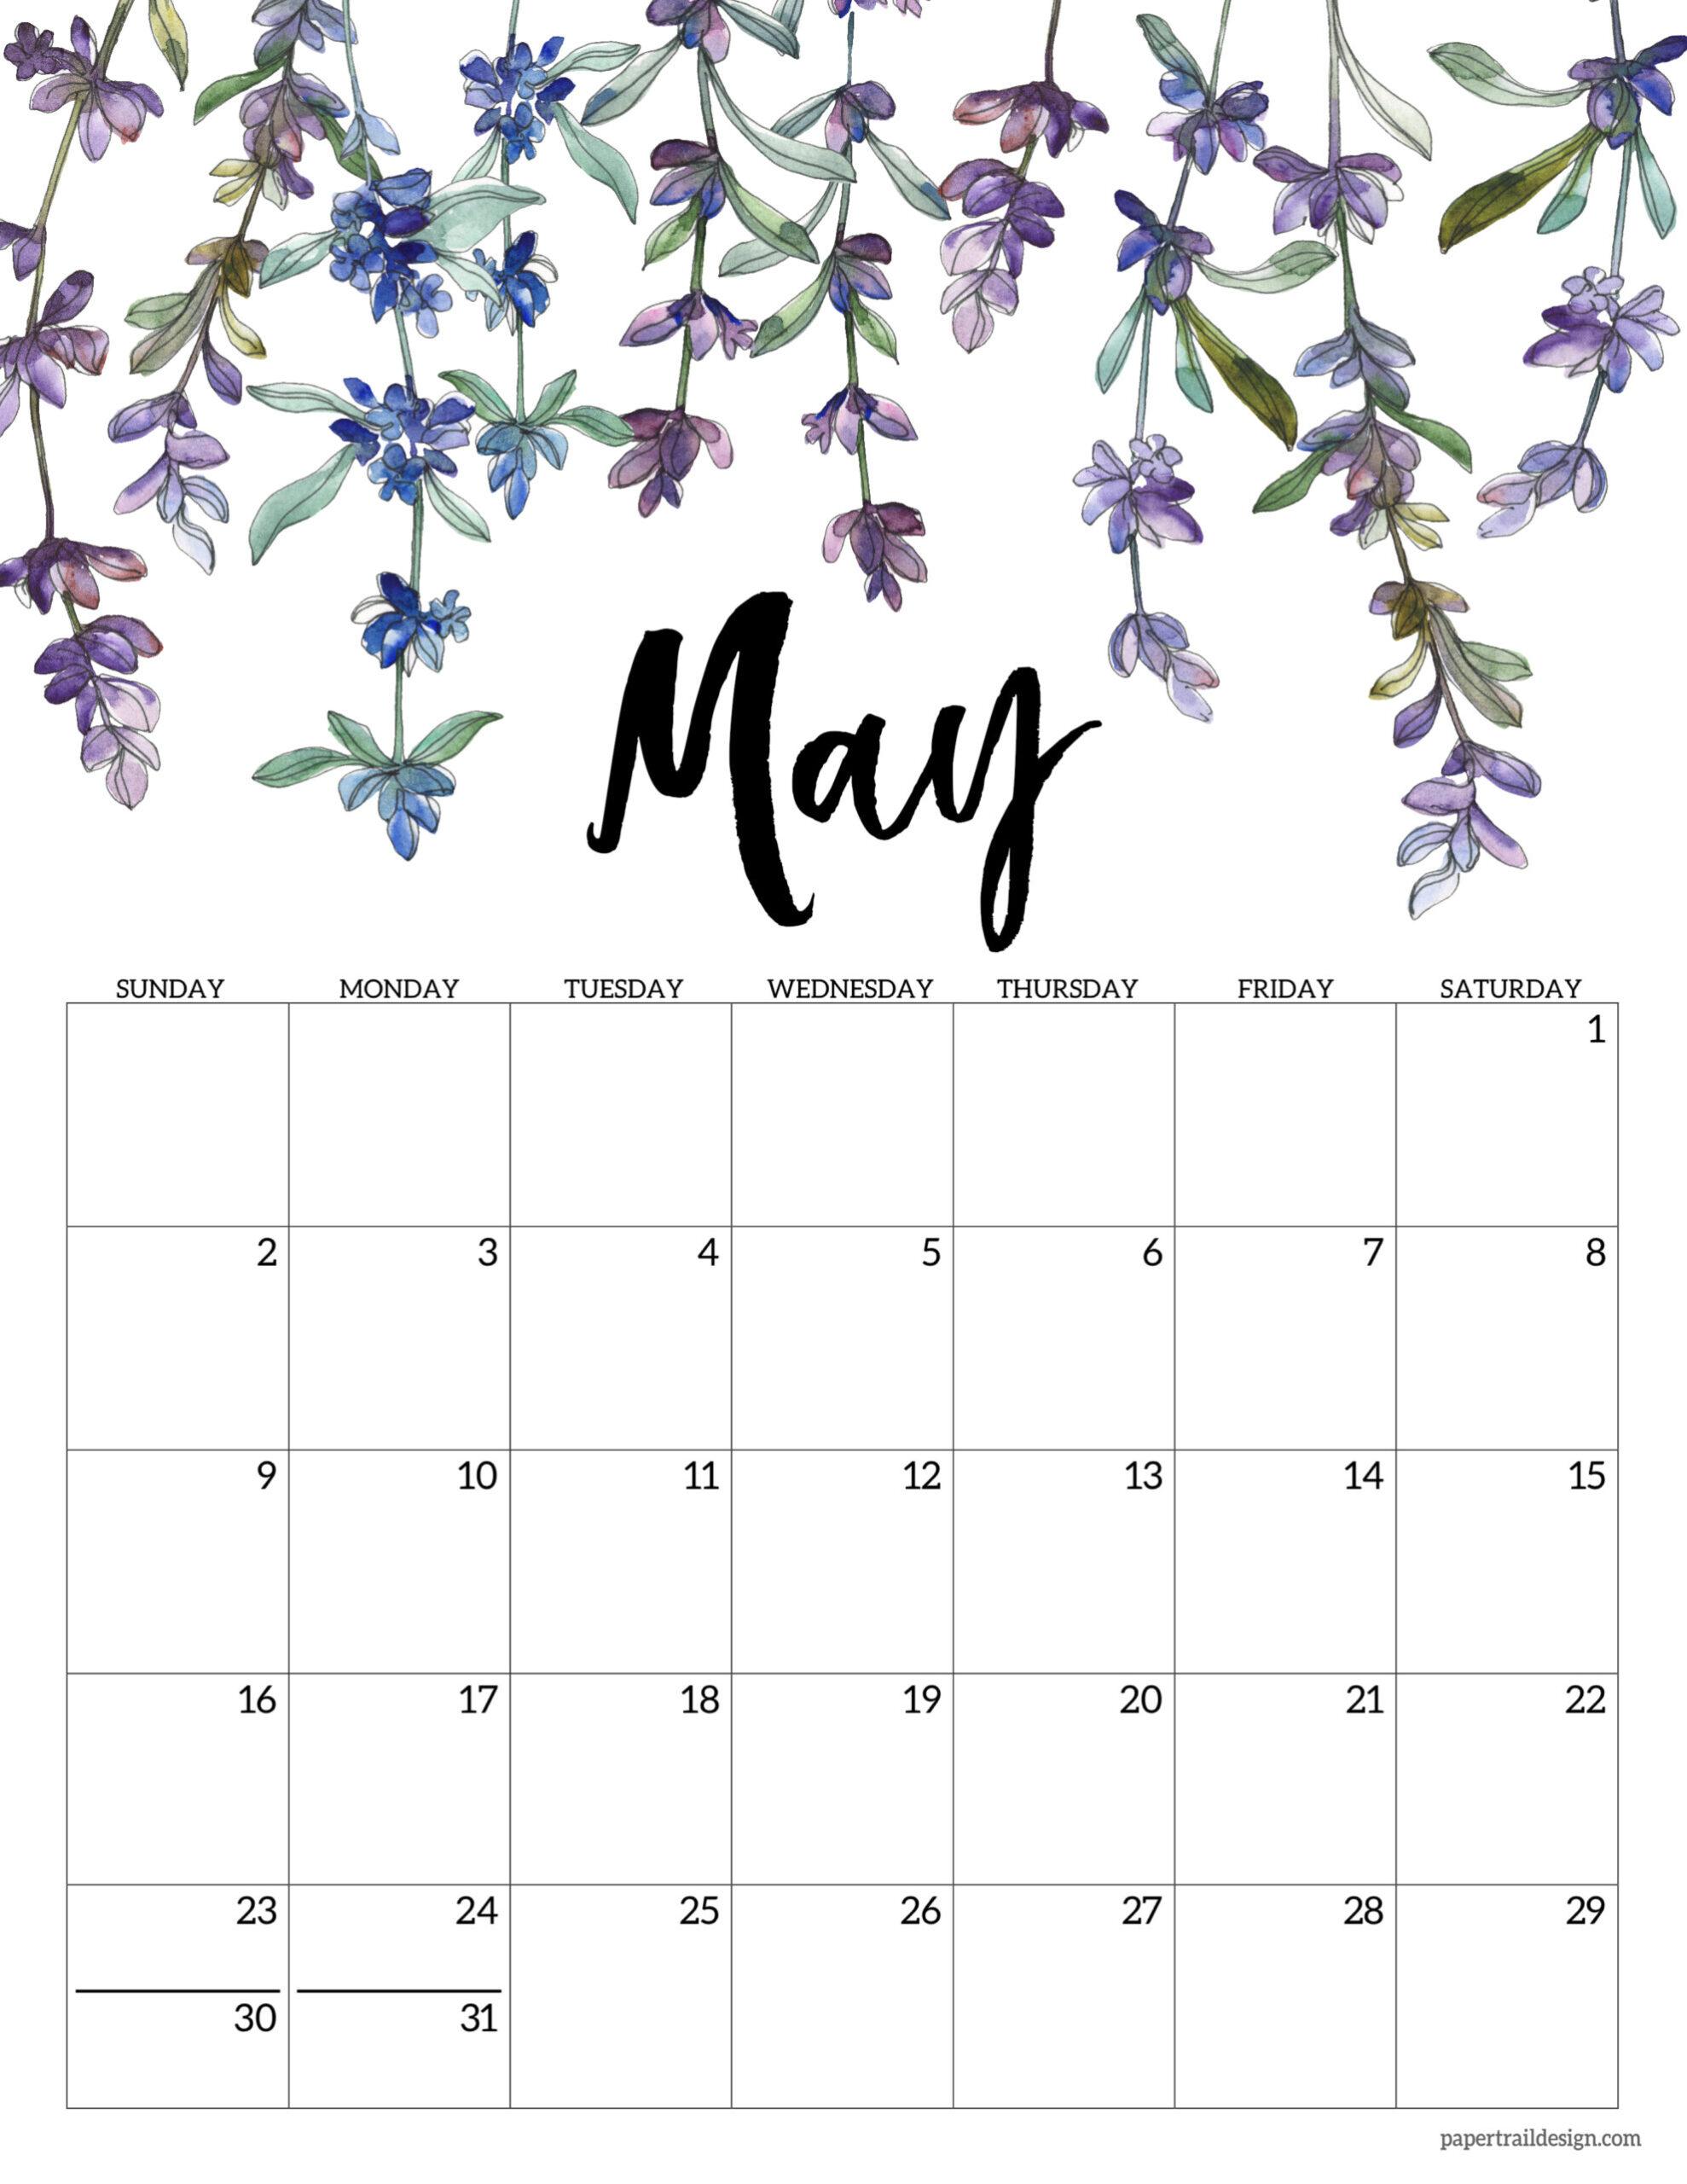 2021 Free Printable Calendar - Floral